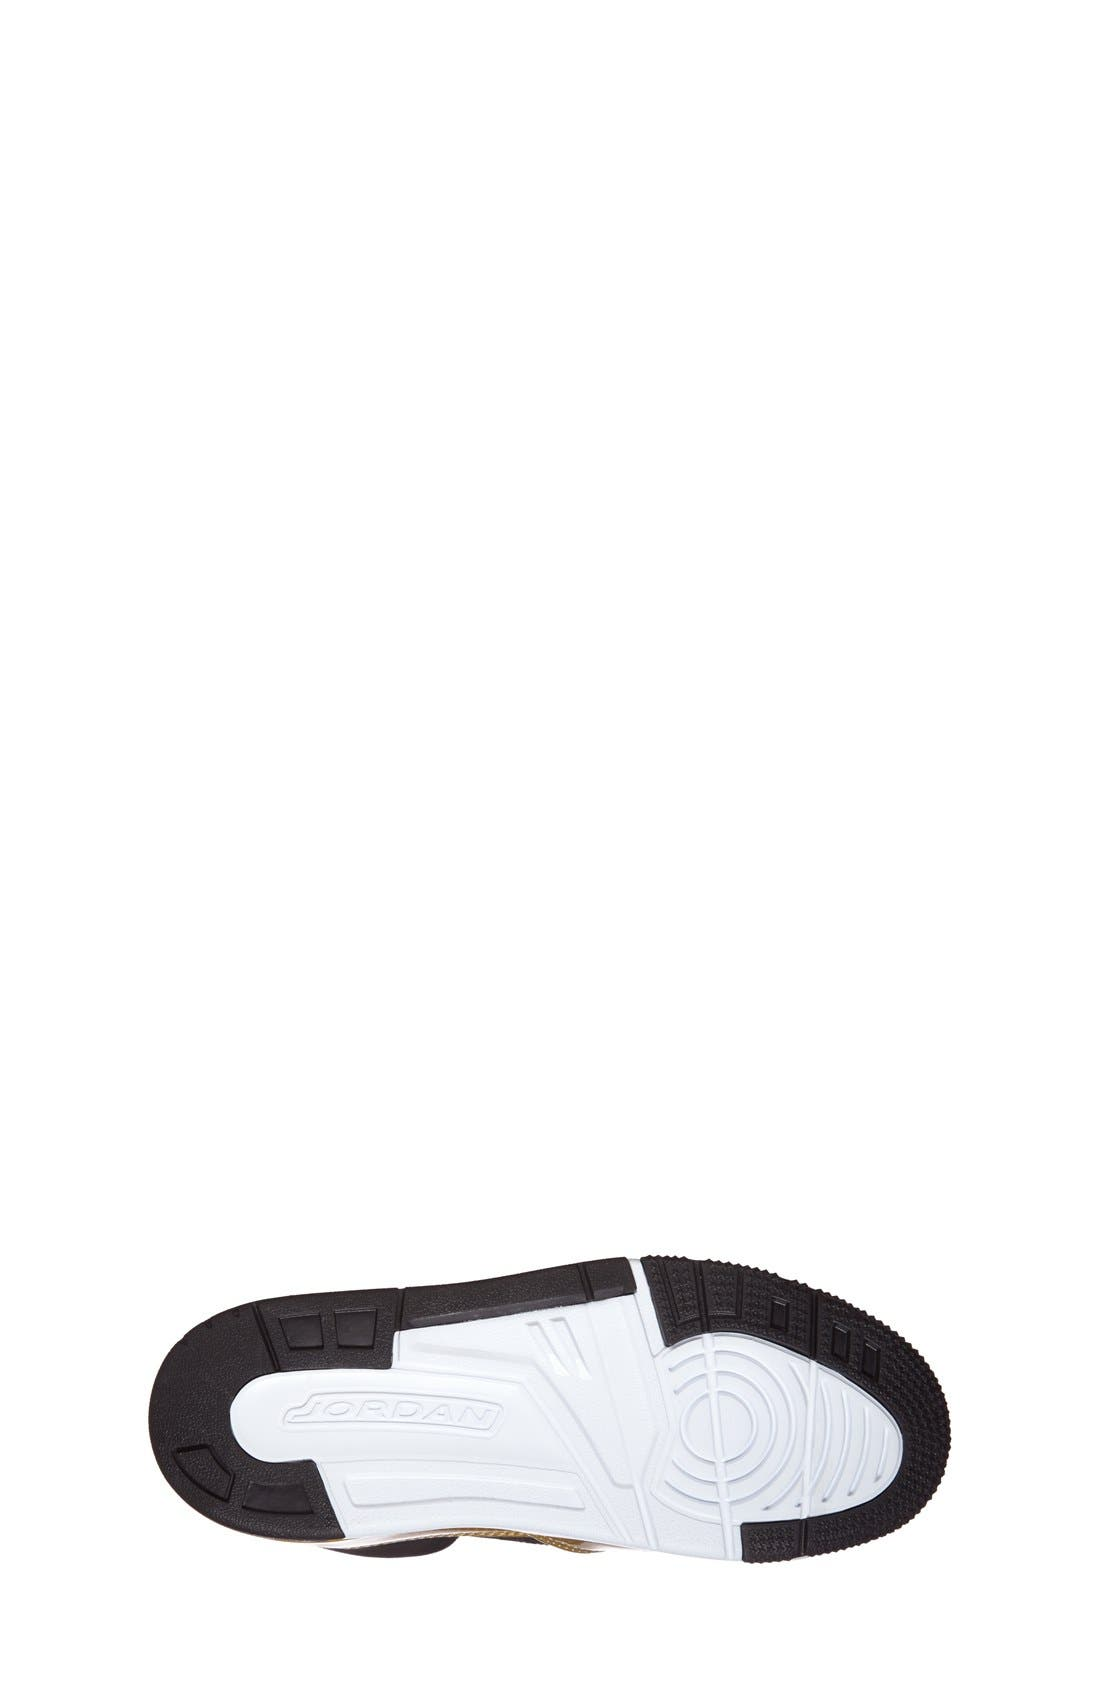 Alternate Image 4  - Nike 'Jordan SC3' Basketball Shoe (Toddler & Little Kid)